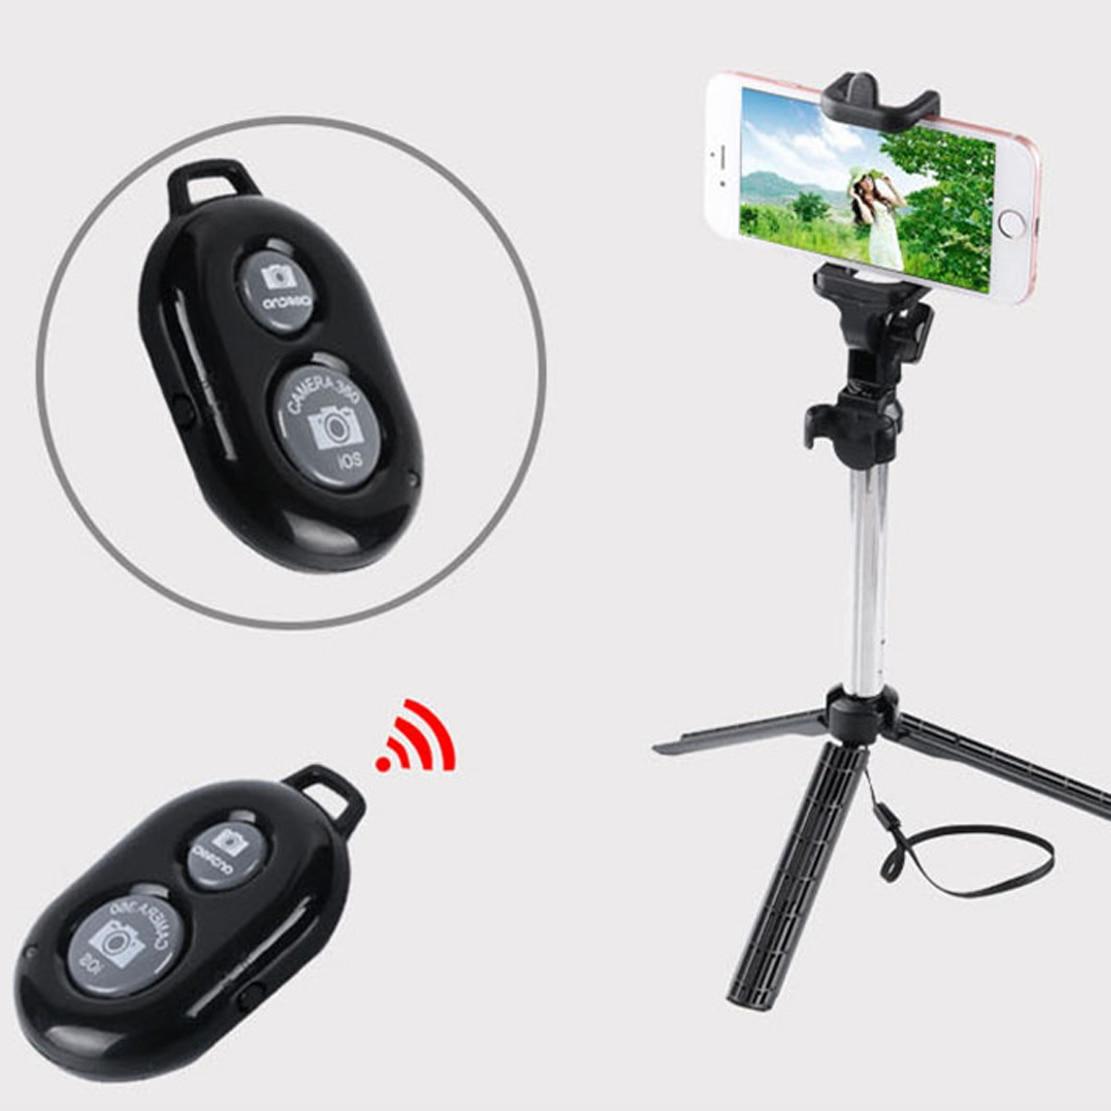 Bluetooth Remote Control Tripod Monopod Selfie Stick Shutter for iPhone Redmi Lenovo Sony ZTE ASUS Wiko Blu Moto Meizu X 8 7 6 5